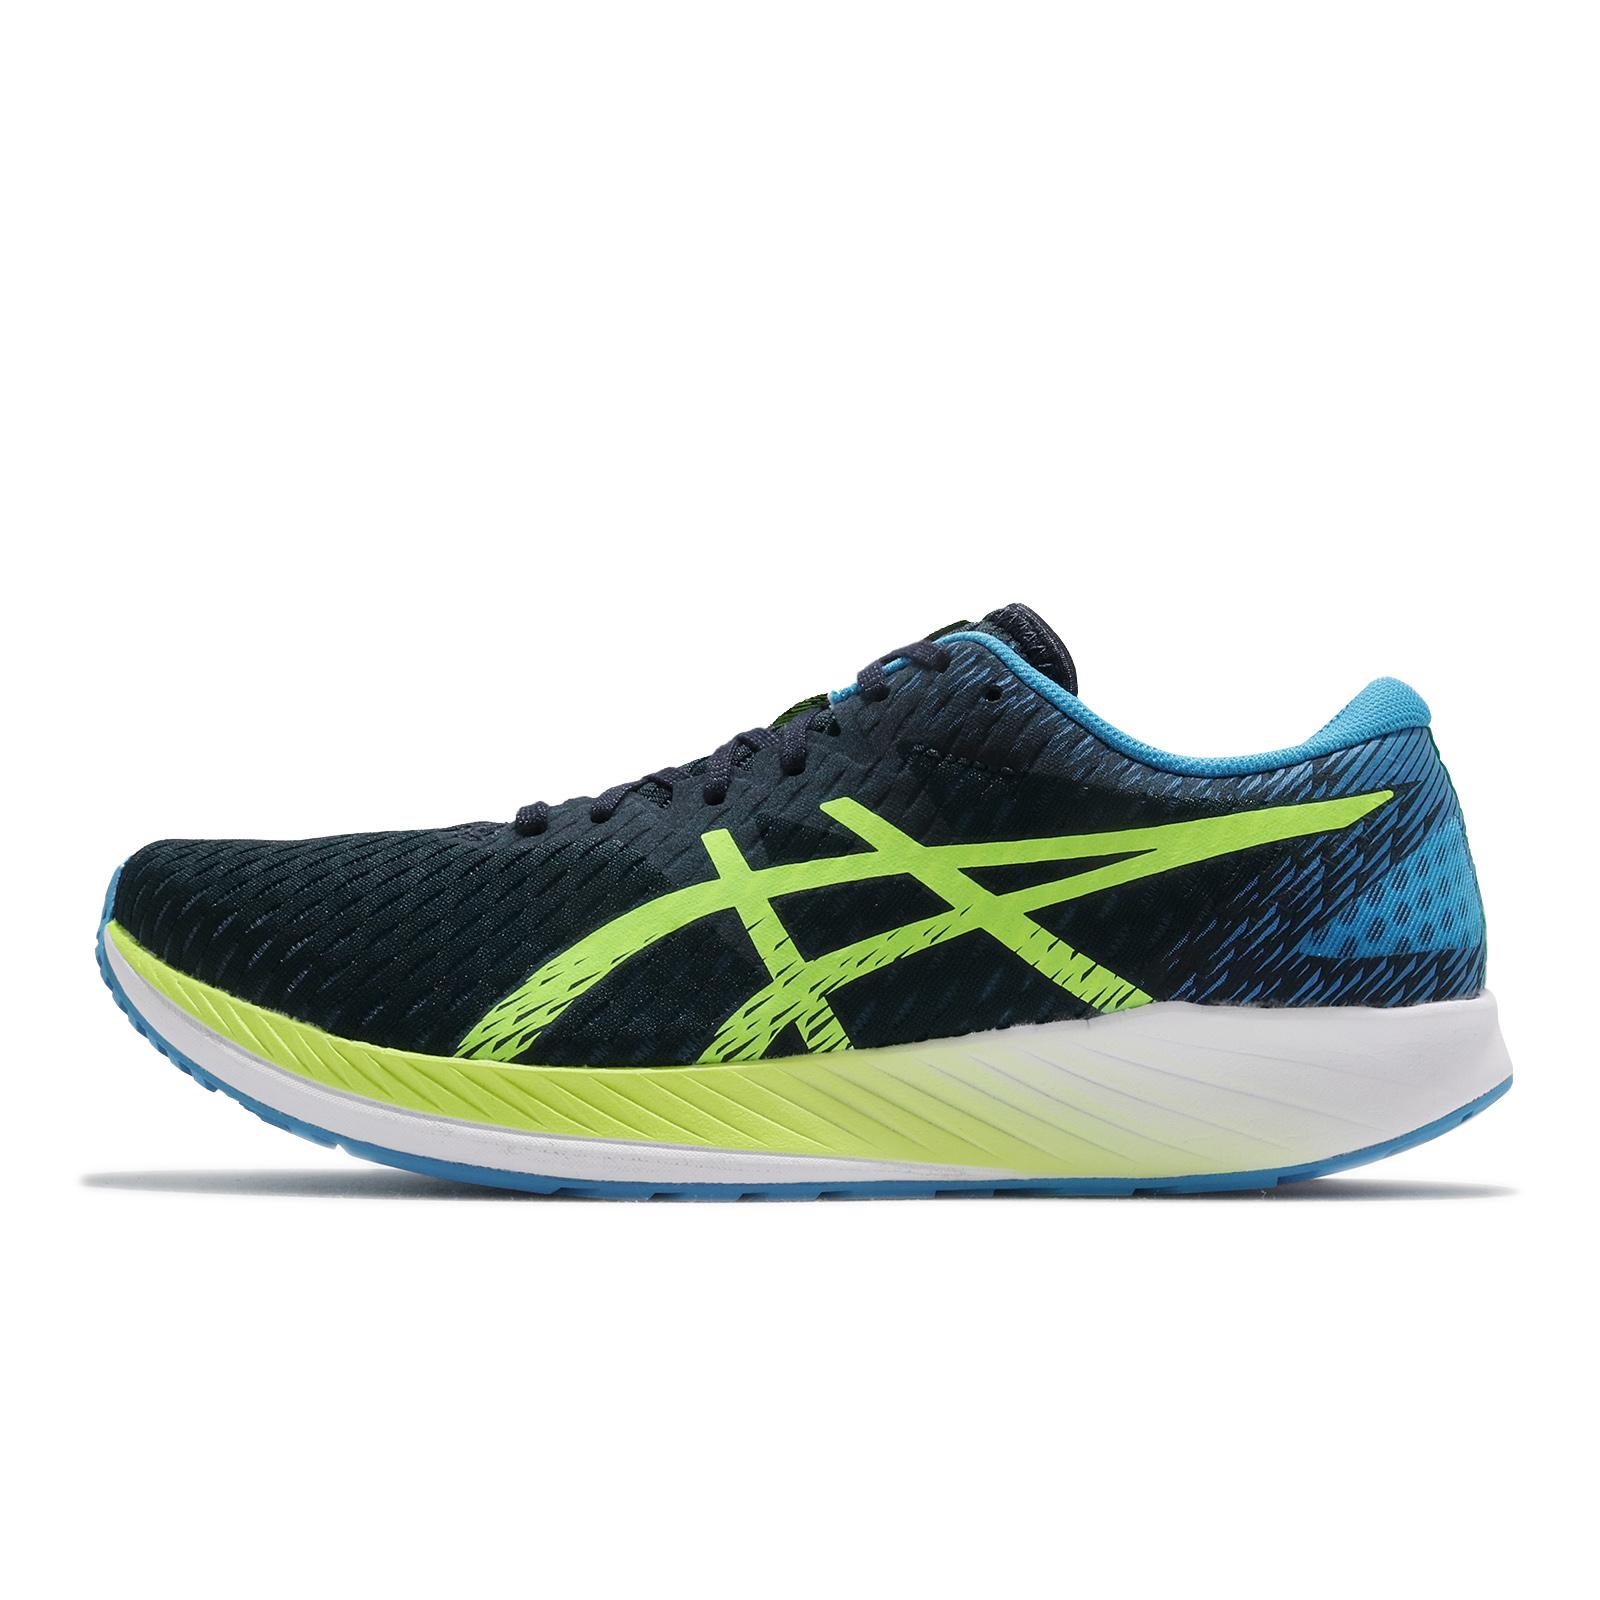 Asics 訓練鞋 Hyper Speed 男 深藍 綠 輕量 透氣 競速 慢跑鞋 【ACS】 1011B025-400